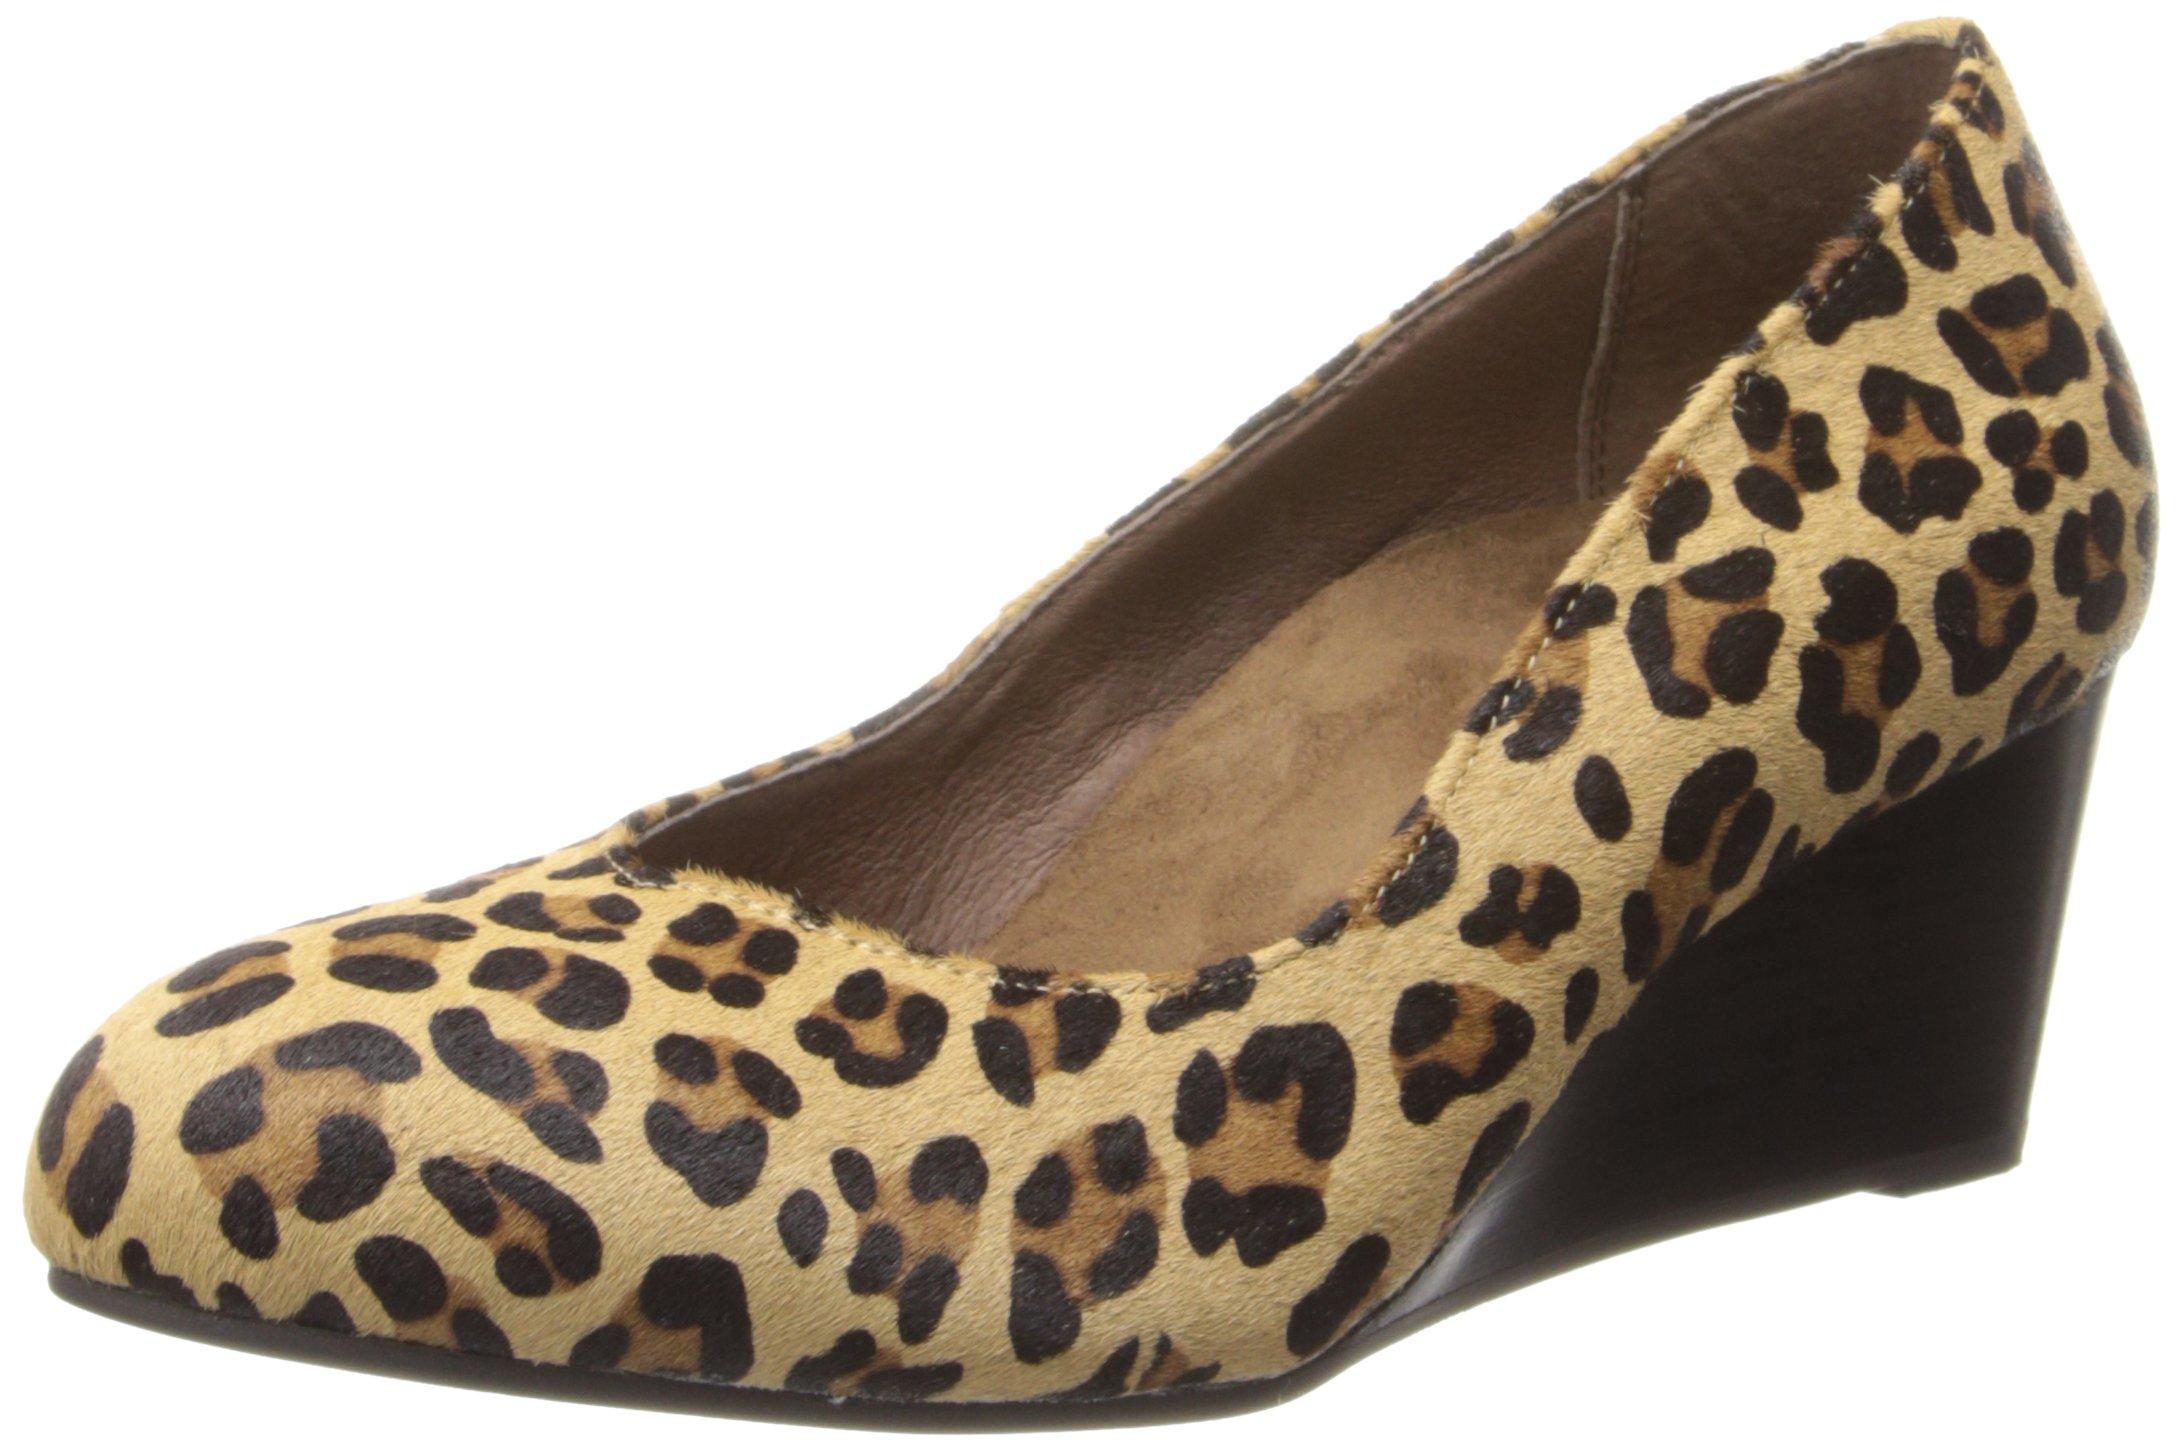 Vionic Antonia Womens Leather Wedge Tan Leopard - 8